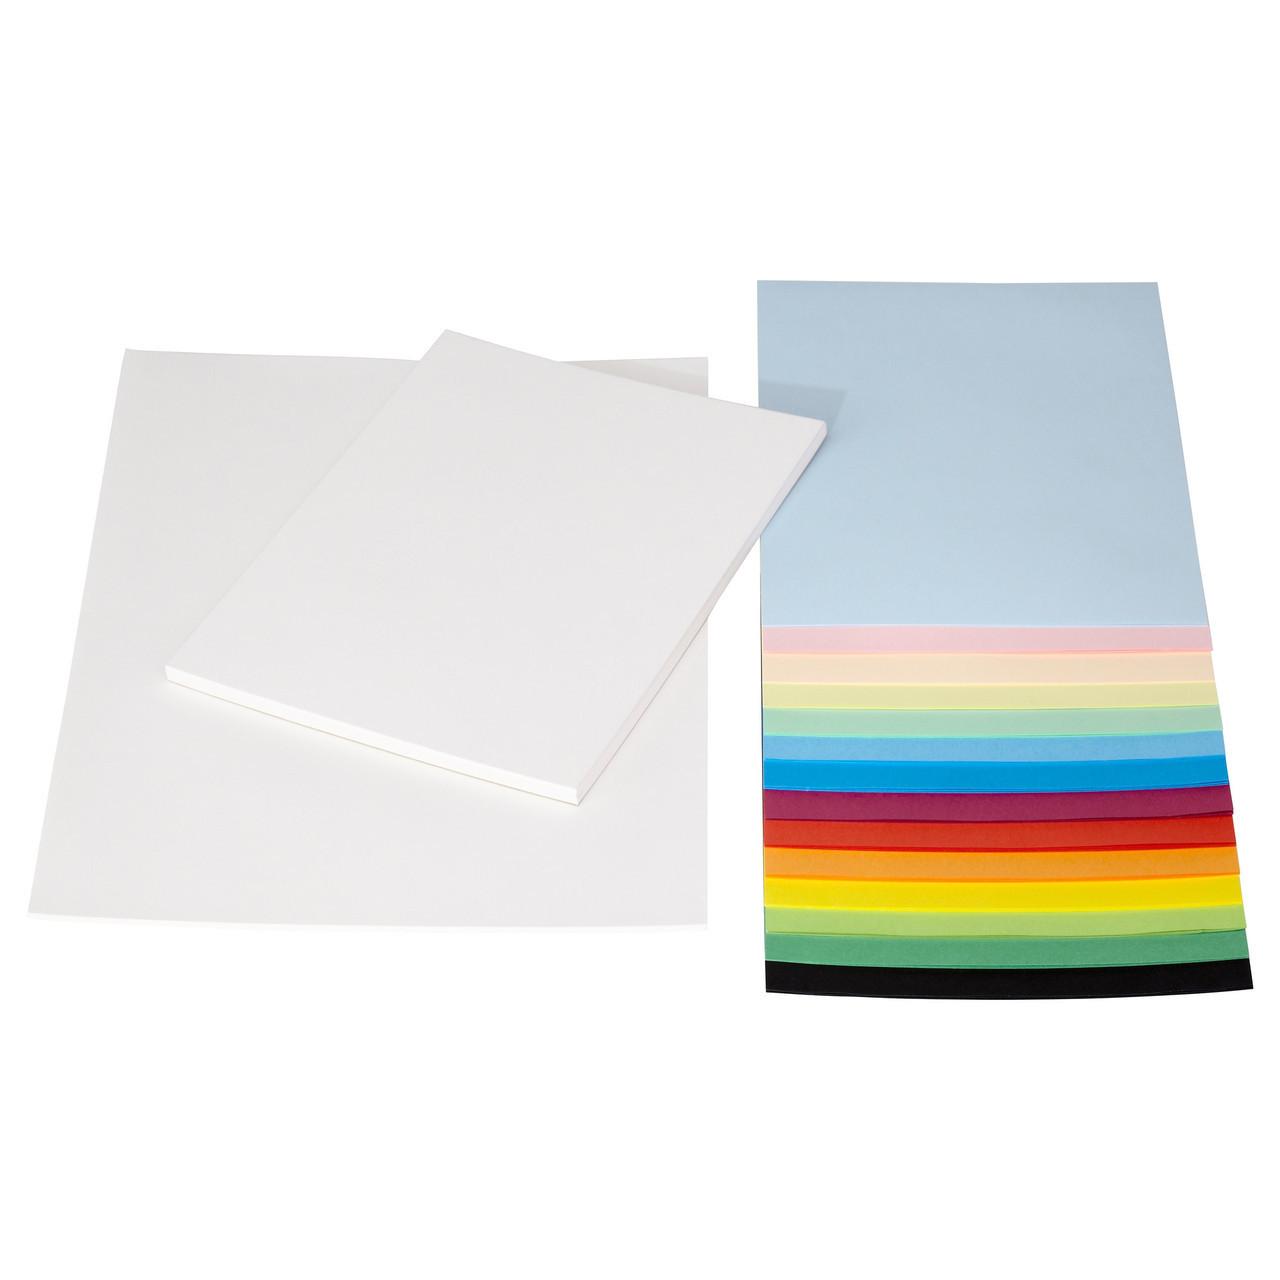 MÅLA Бумага, разные цвета, различные размеры 301.933.23